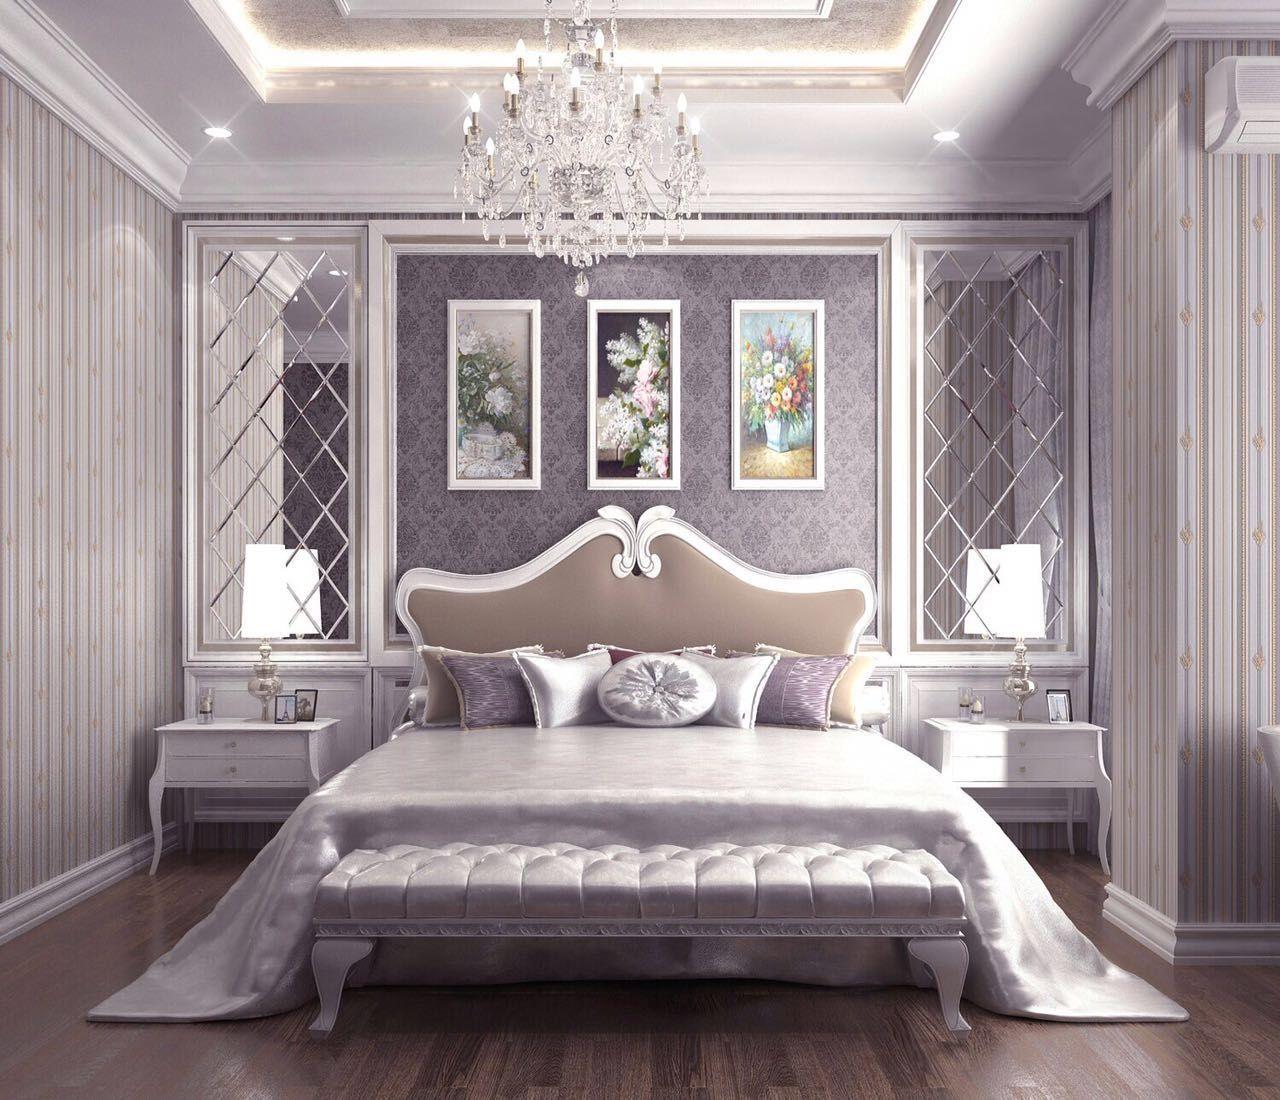 Bedroom Furniture Decor Decoration Design Designfurniture